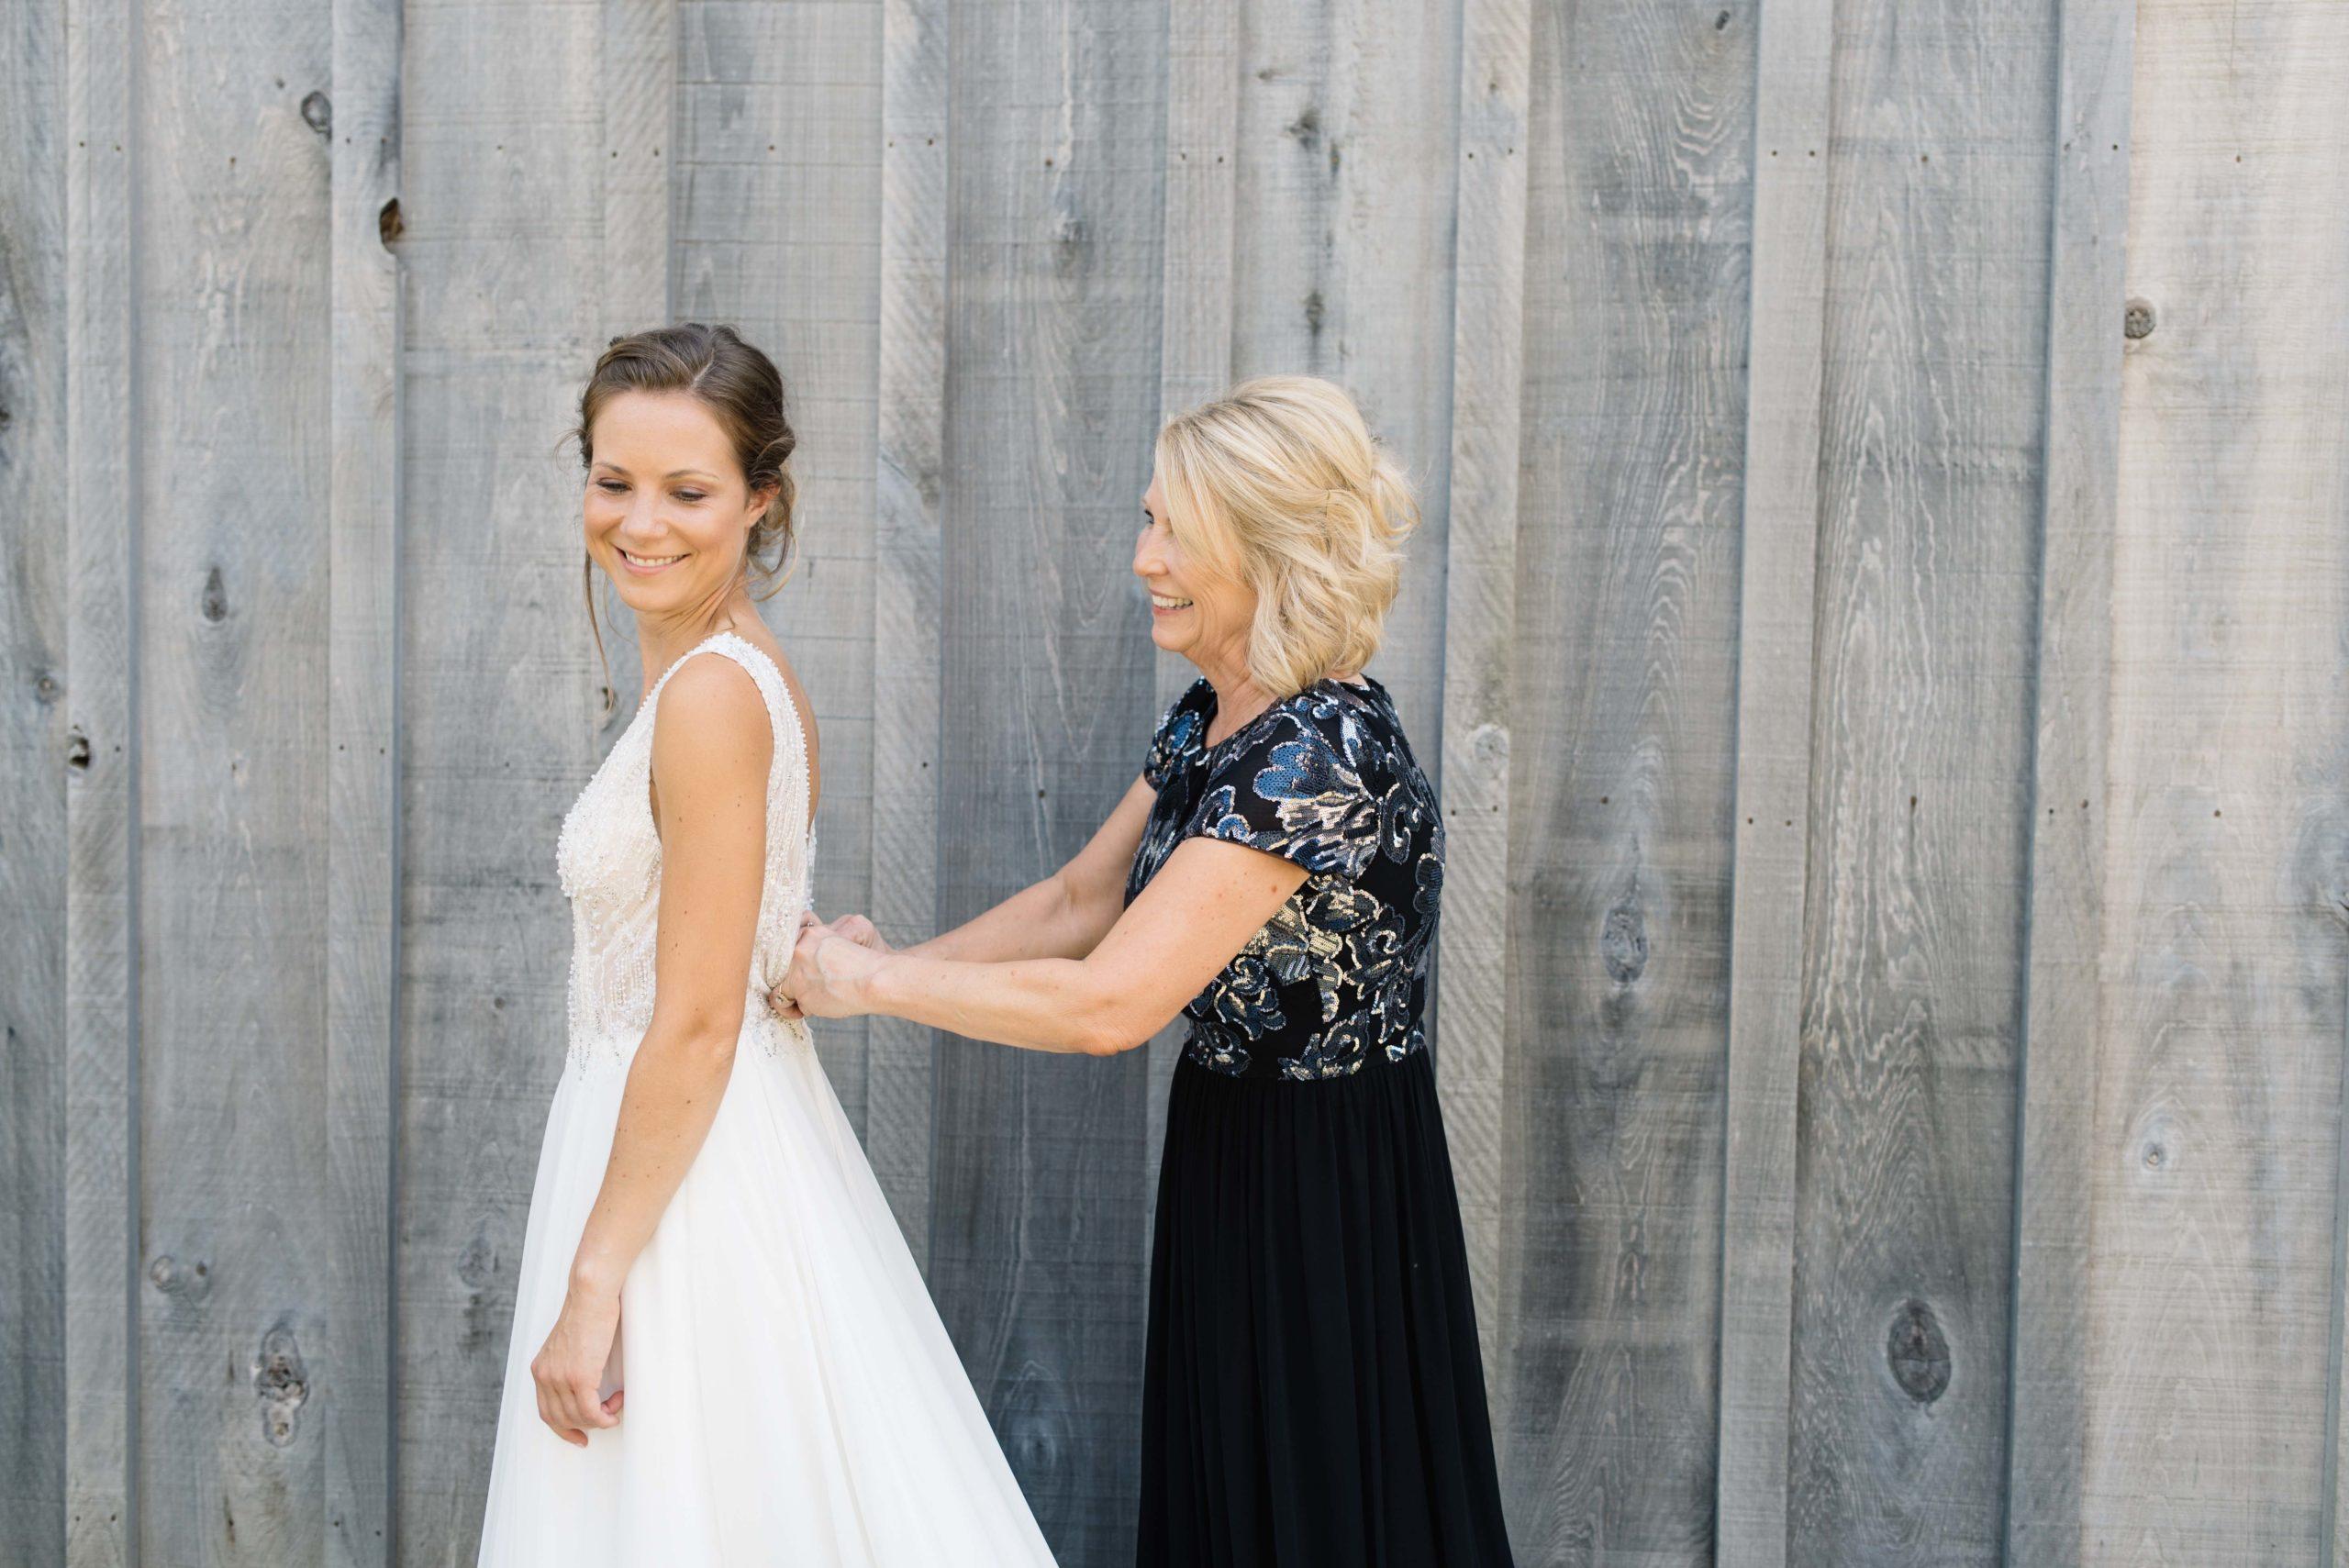 mom helping bride button wedding dress schafer century barn wedding venue